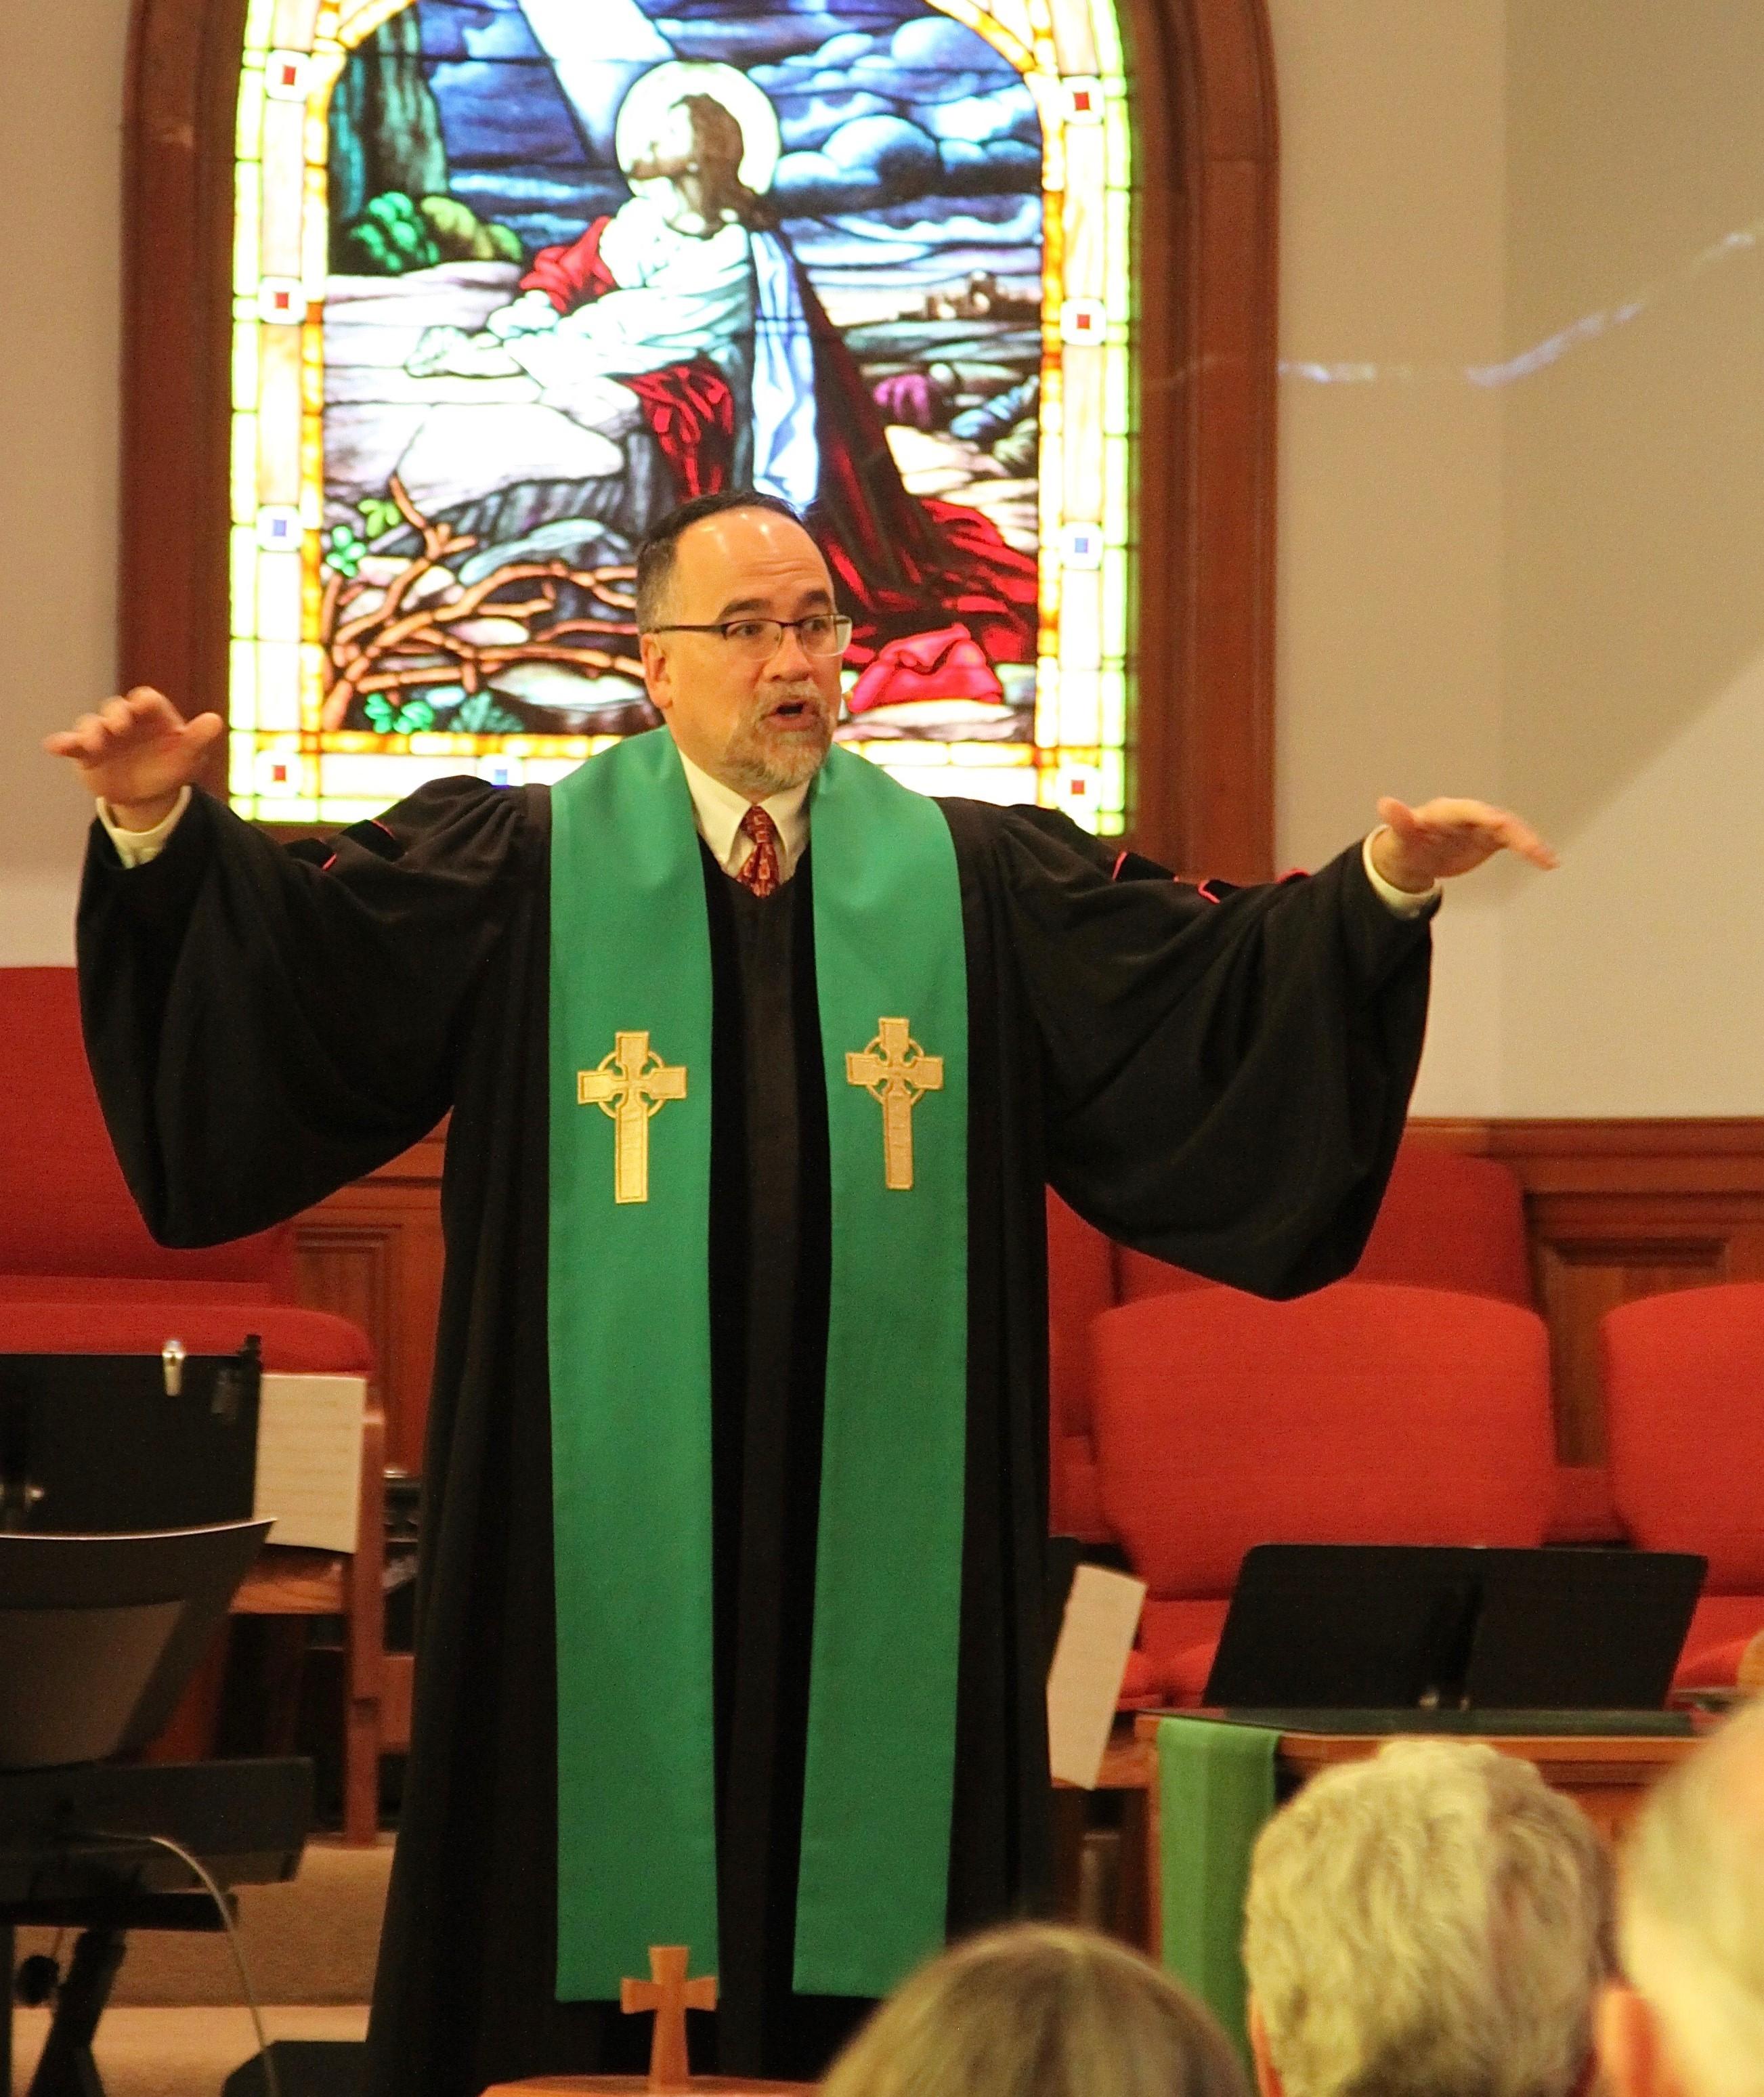 Pastor Matt speaking to the congregation.